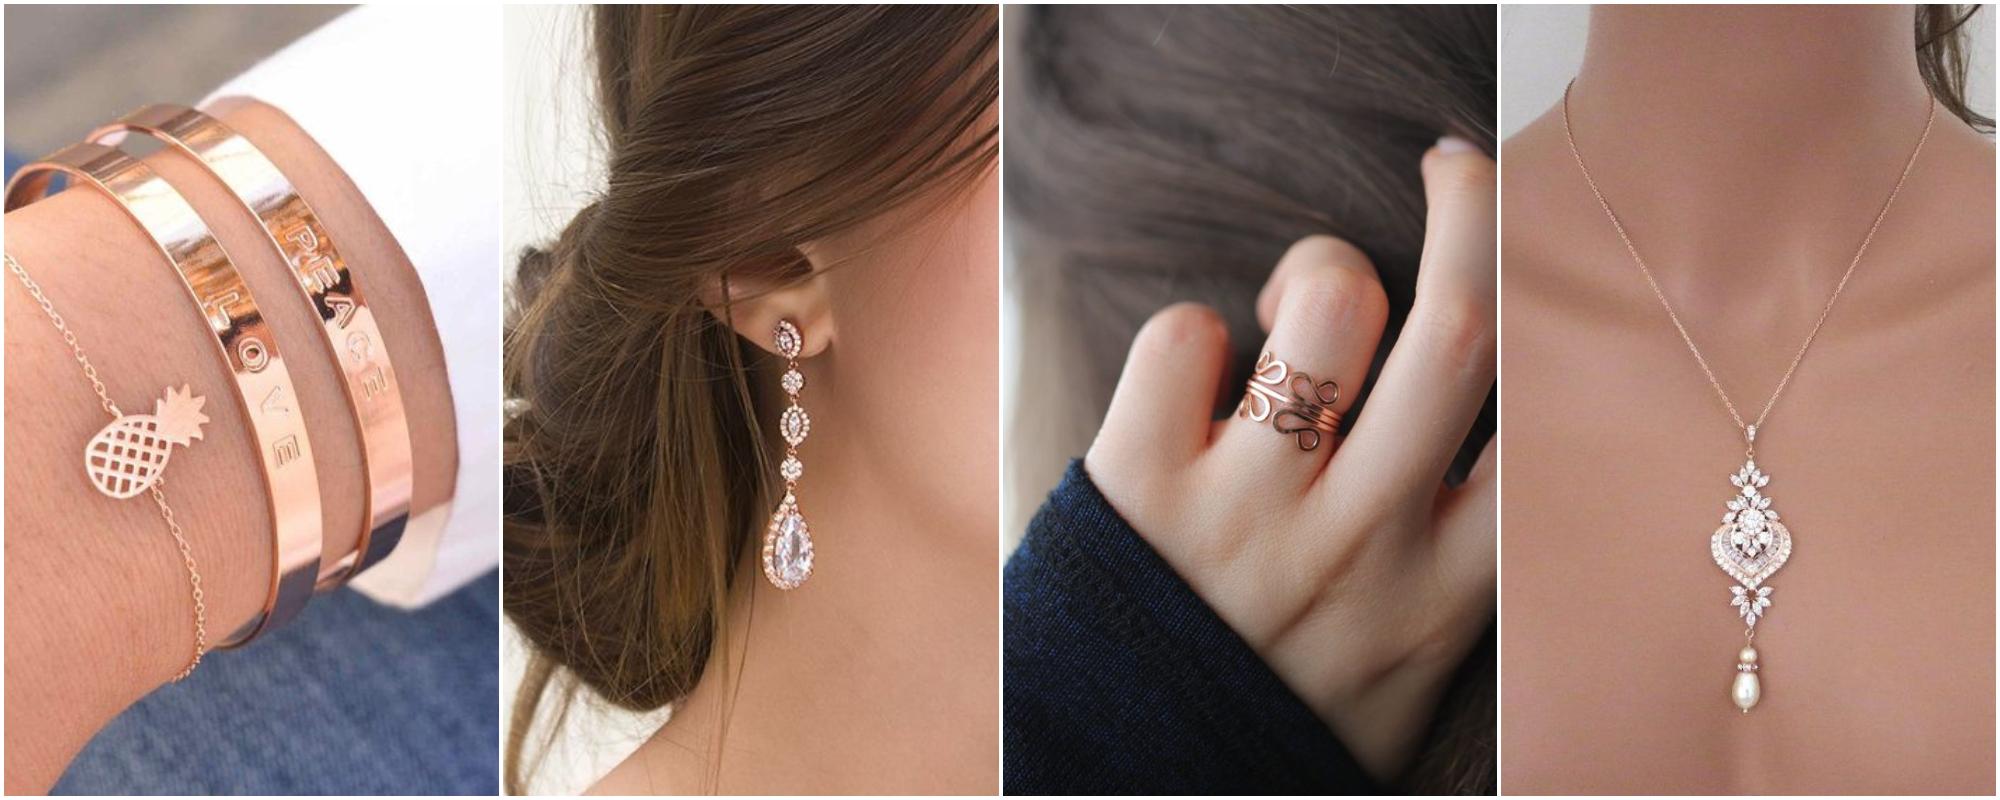 Rose Gold – A tendência das semi joias em ouro rose